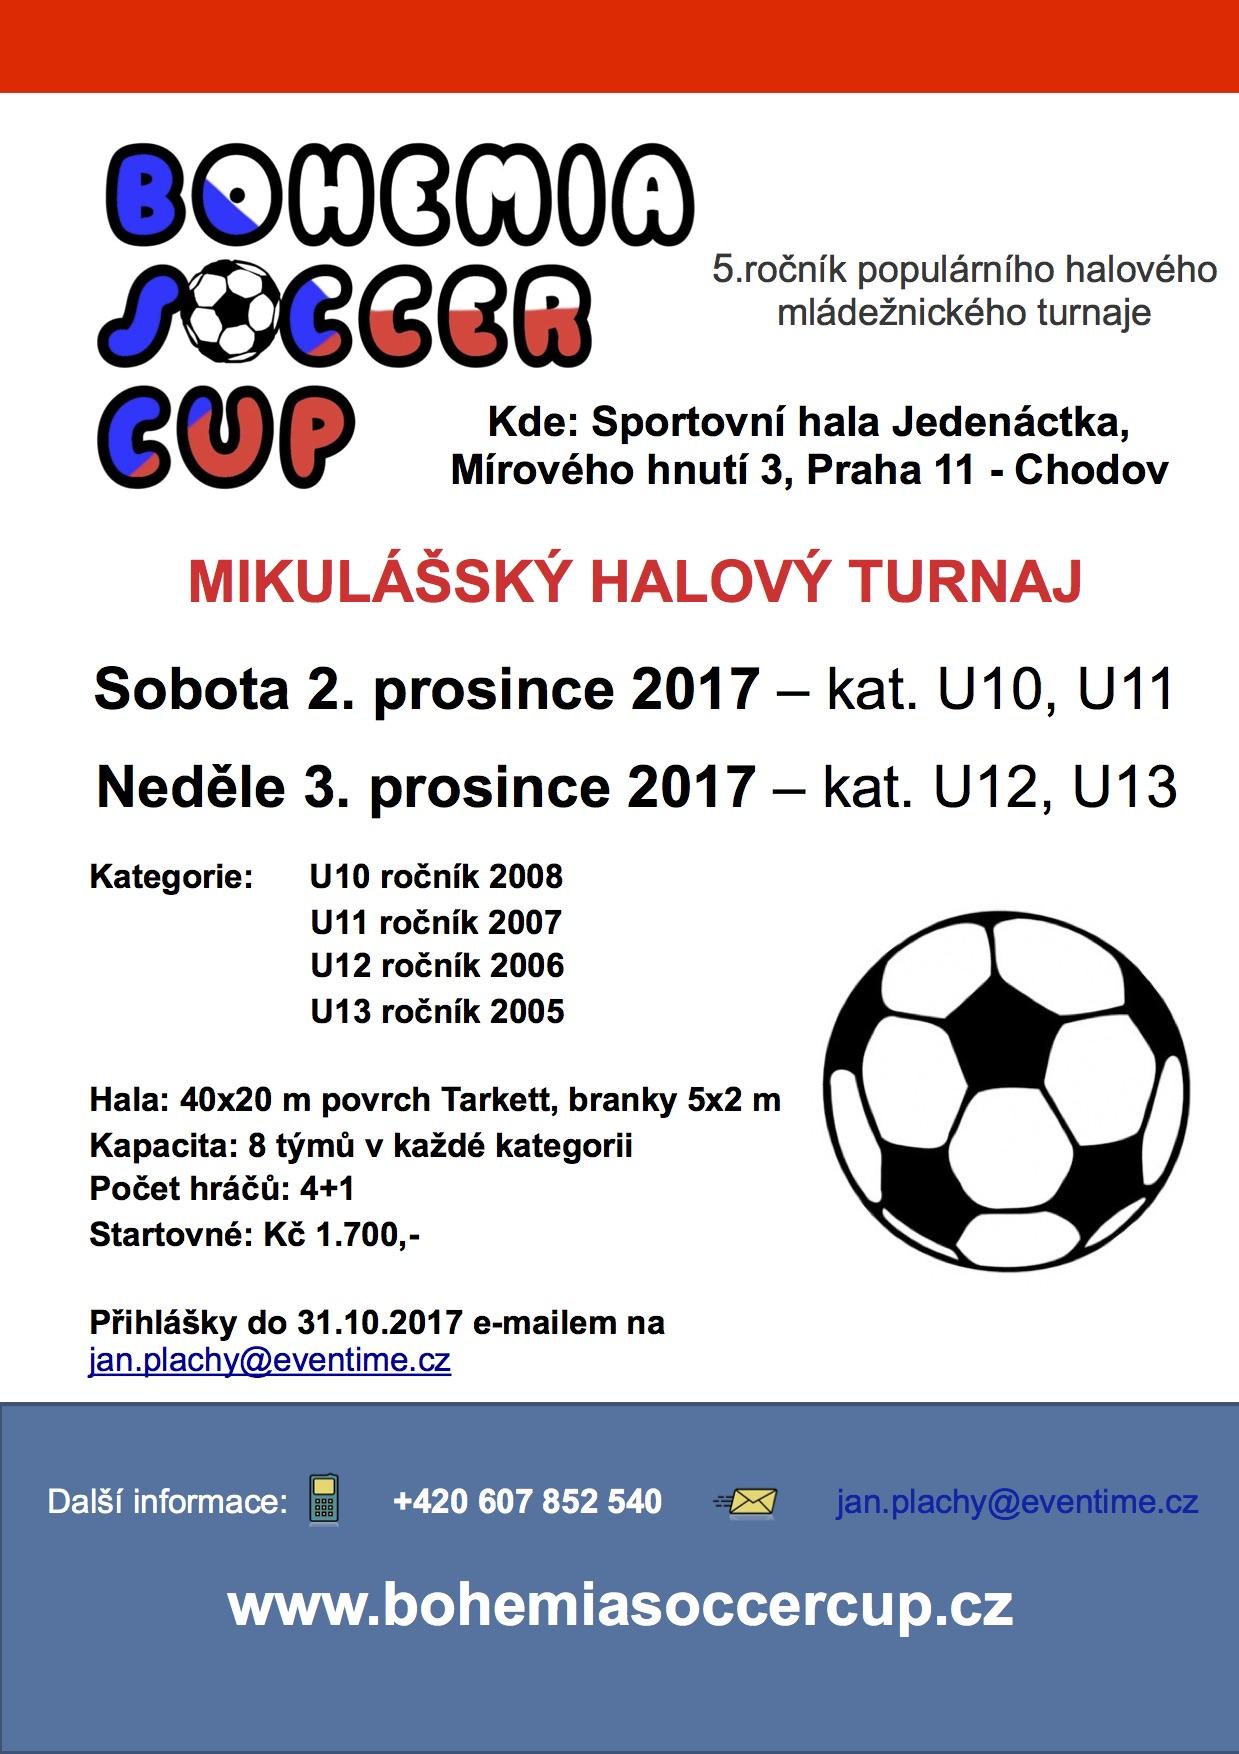 Bohemia Soccer Cup 2017